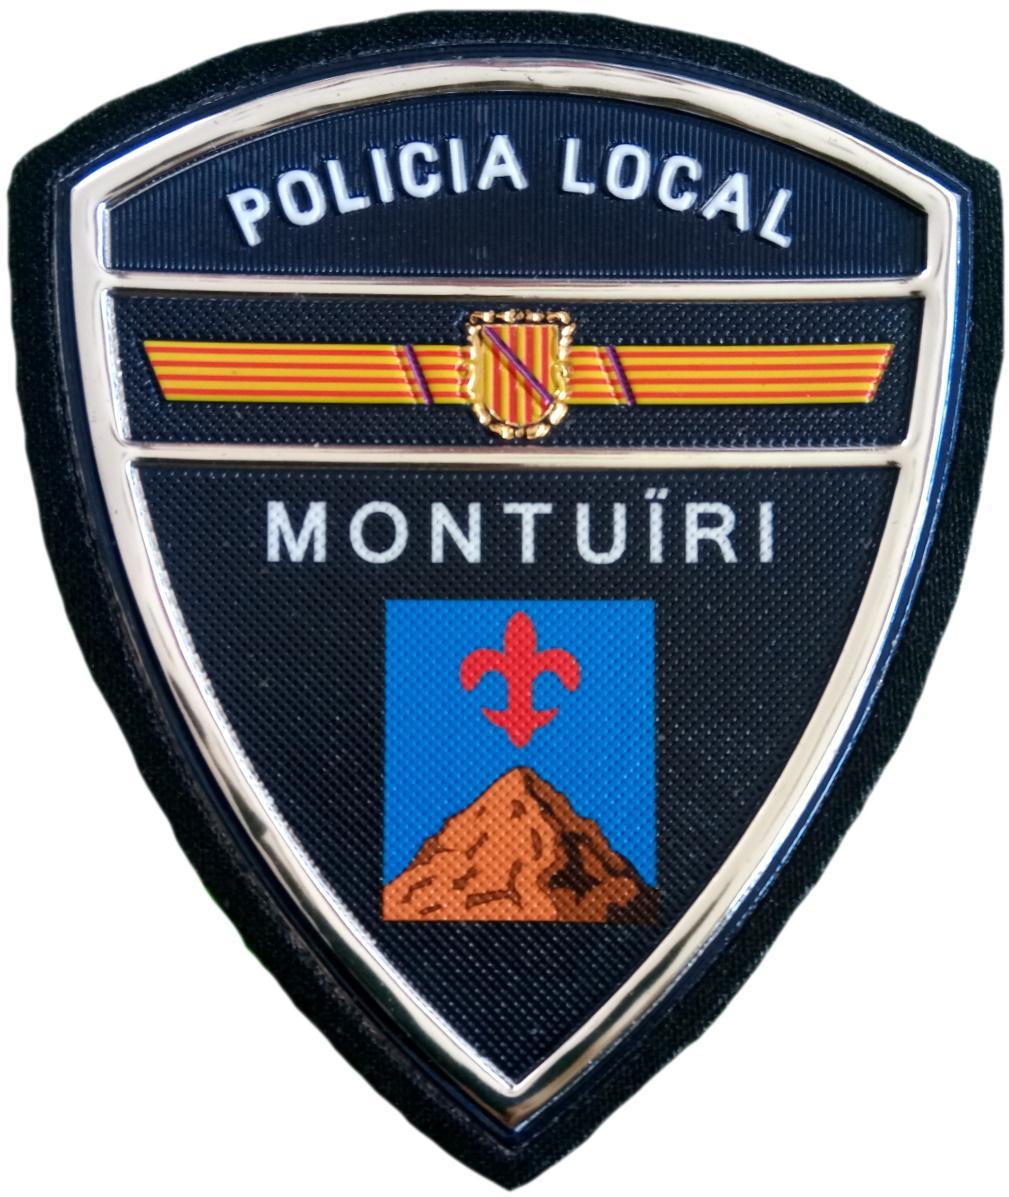 Policía Local Montuiri parche insignia emblema distintivo